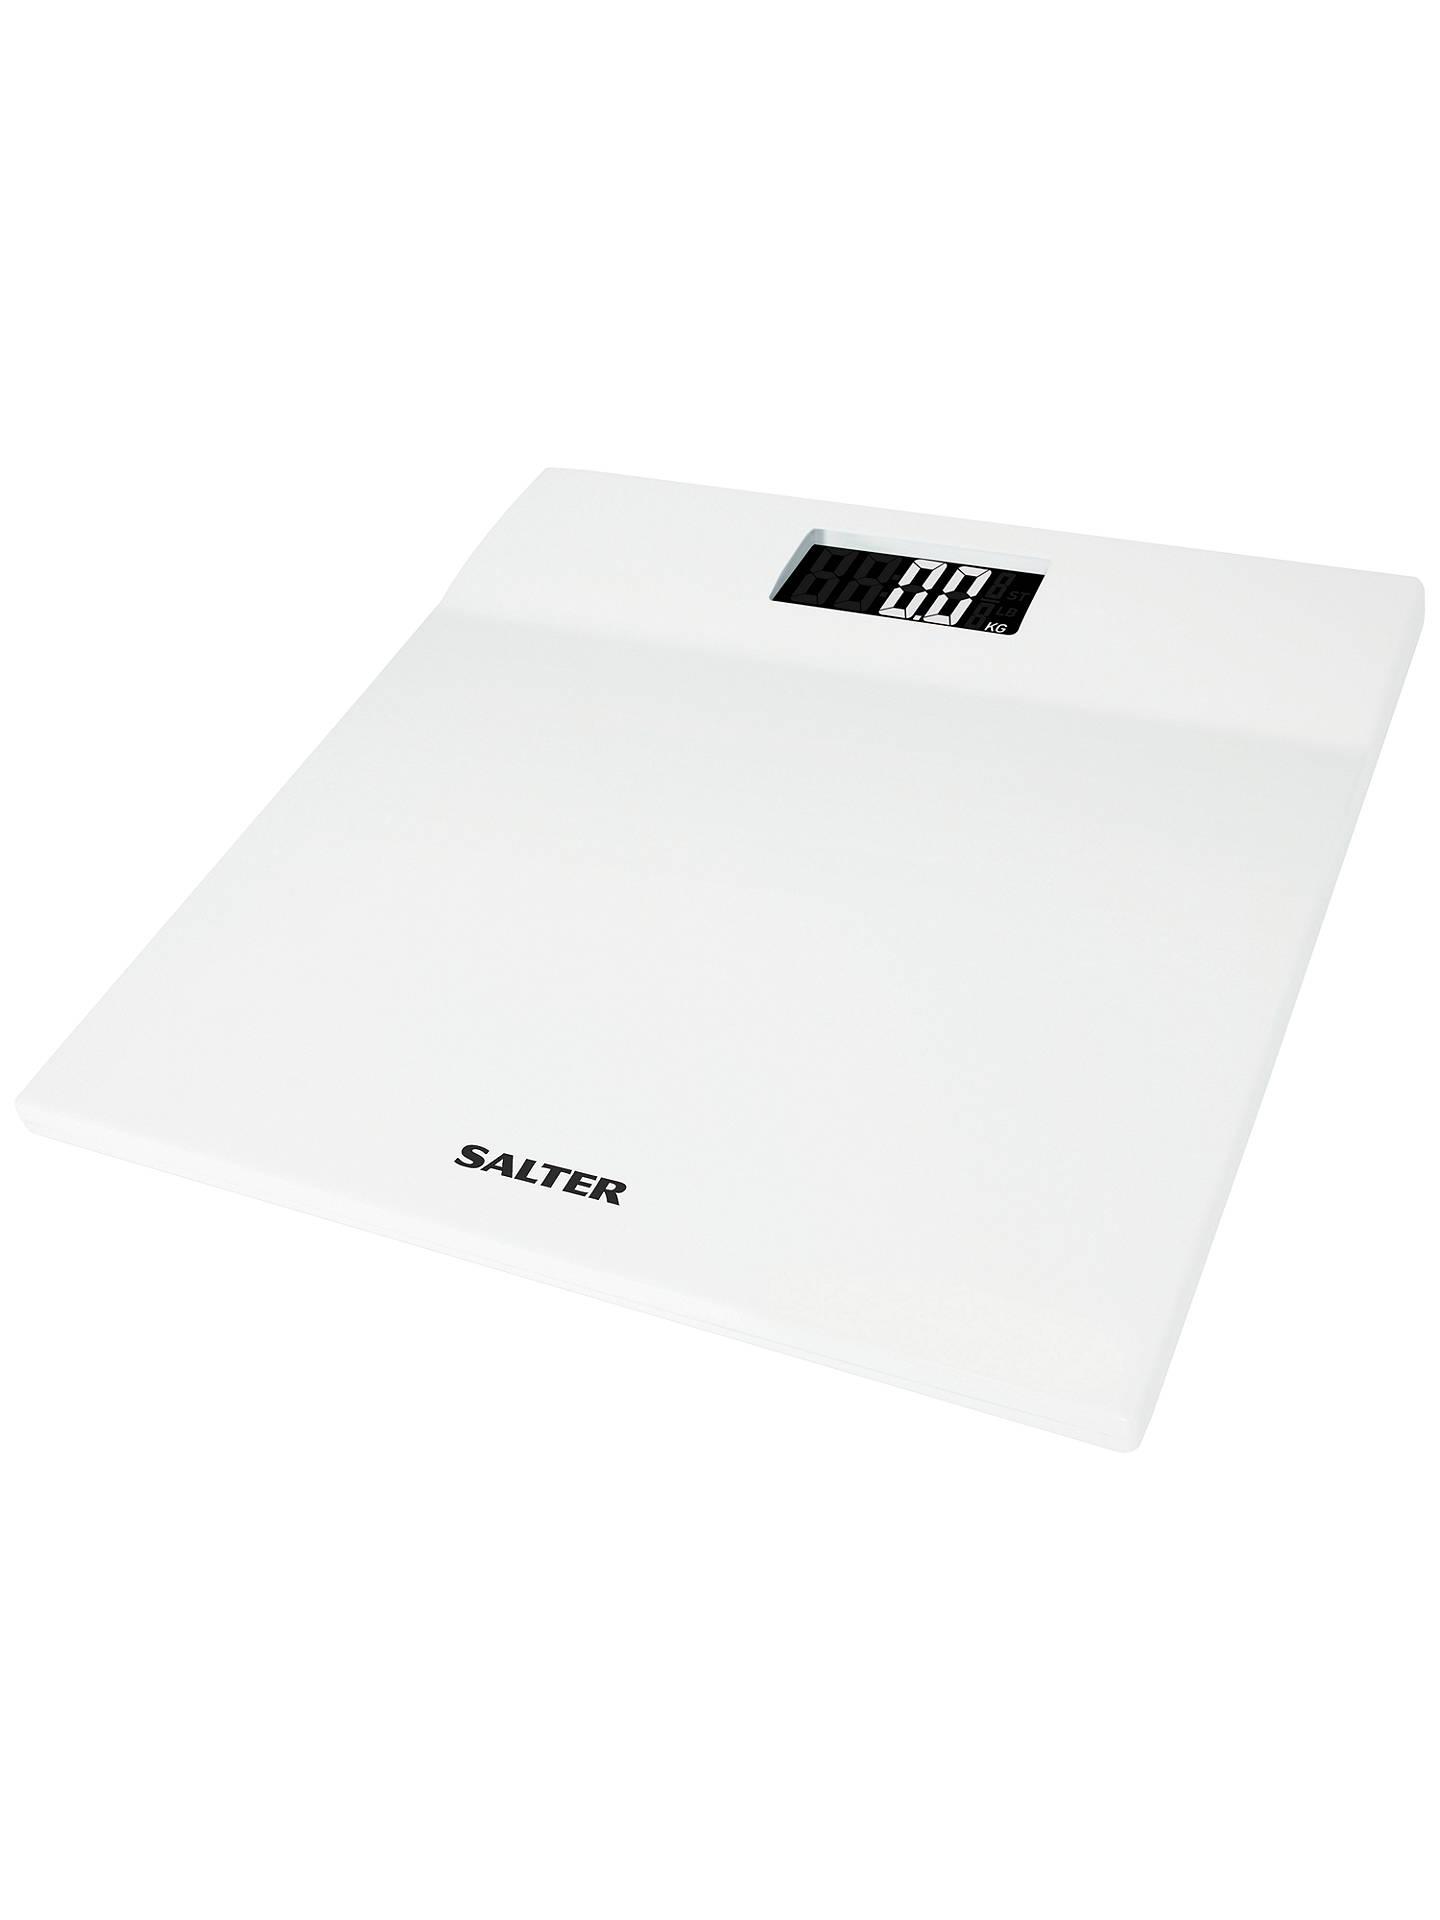 Salter Slimline Digital Bathroom Scale